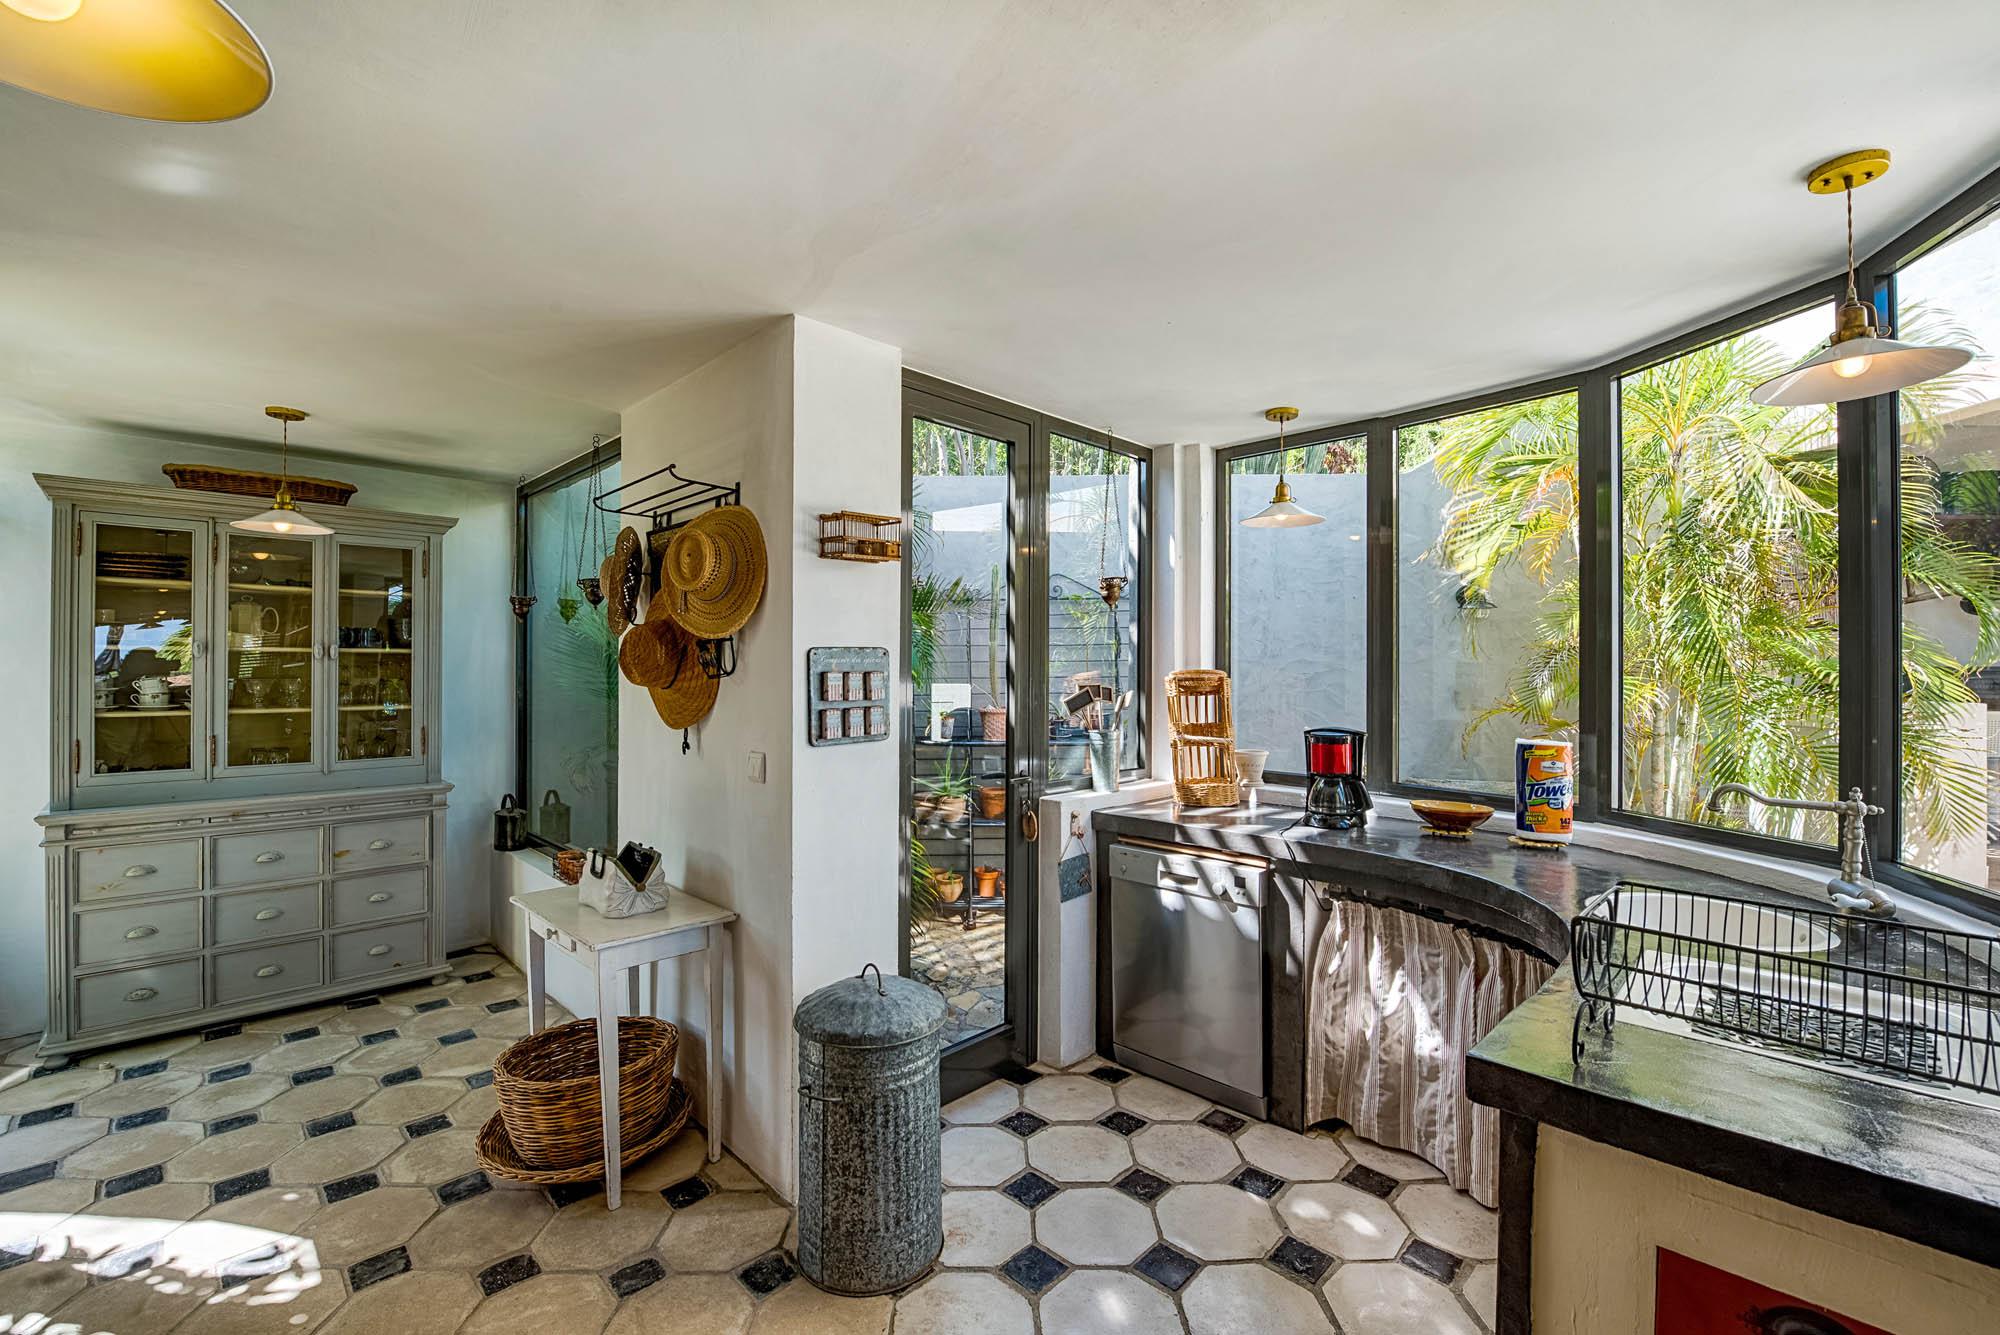 The open and stylish gourmet kitchen at Le Mas des Sables villa rental, Baie aux Cayes, Terres Basses, Saint Martin, Caribbean.